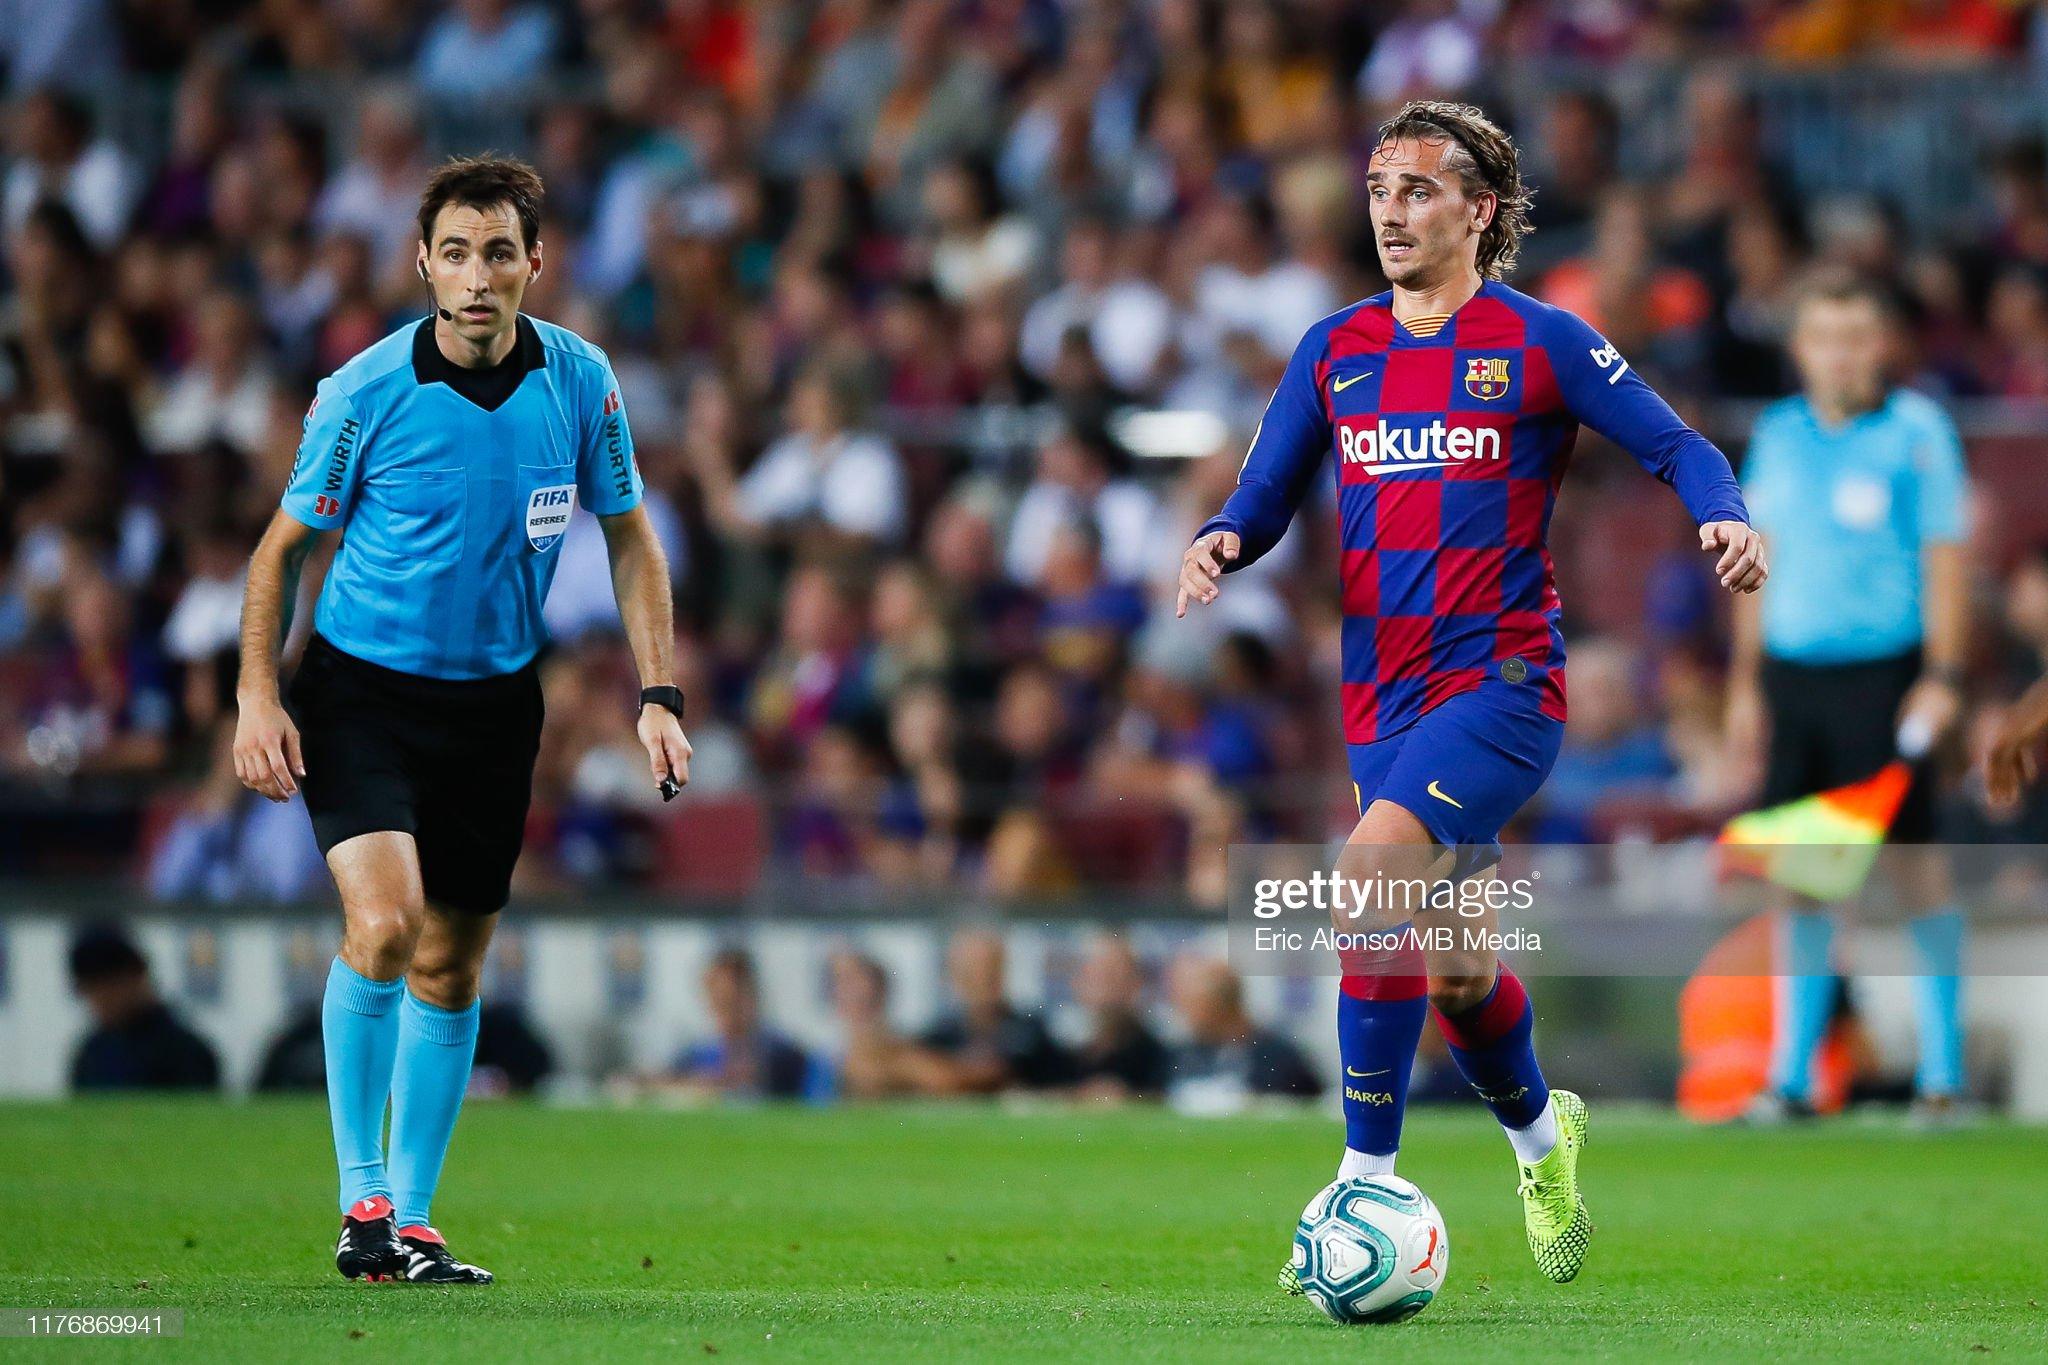 صور مباراة : برشلونة - فياريال 2-1 ( 24-09-2019 )  Antoine-griezmann-of-fc-barcelona-runs-with-the-ball-during-the-liga-picture-id1176869941?s=2048x2048